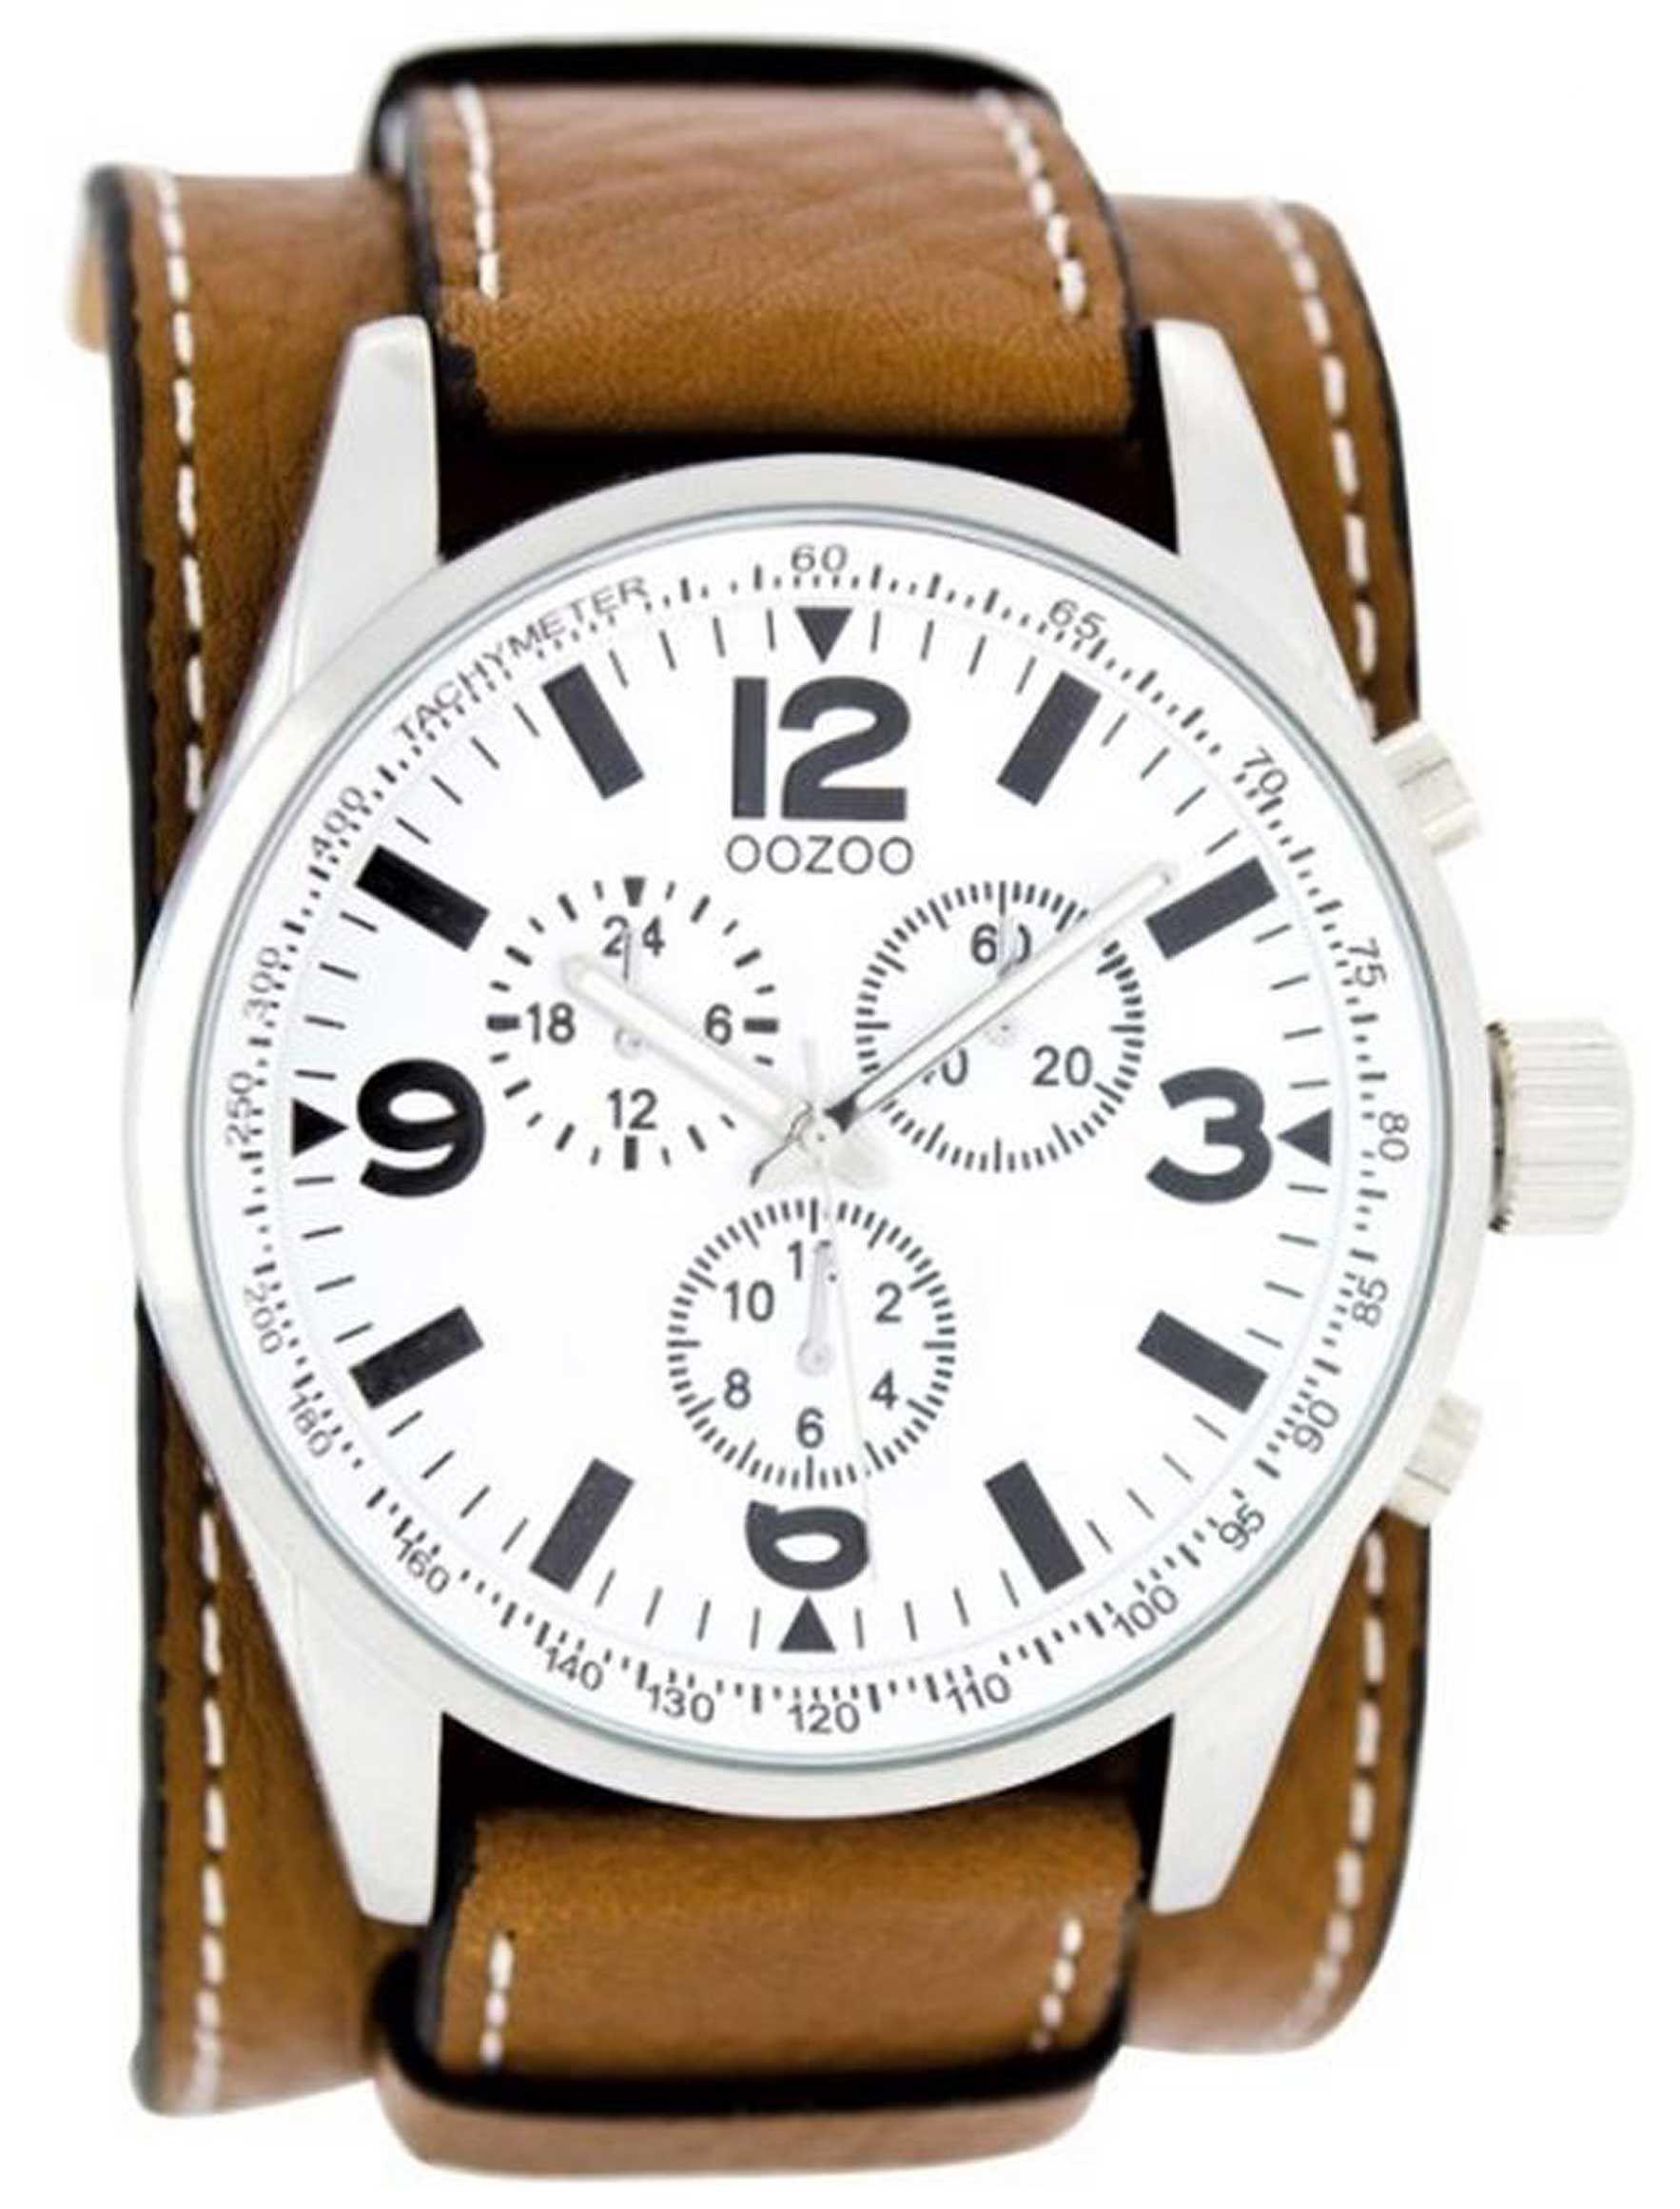 Rapt Oozoo Cognac Cuff Watch 89 Cuff Watch Accessories Leather Watch